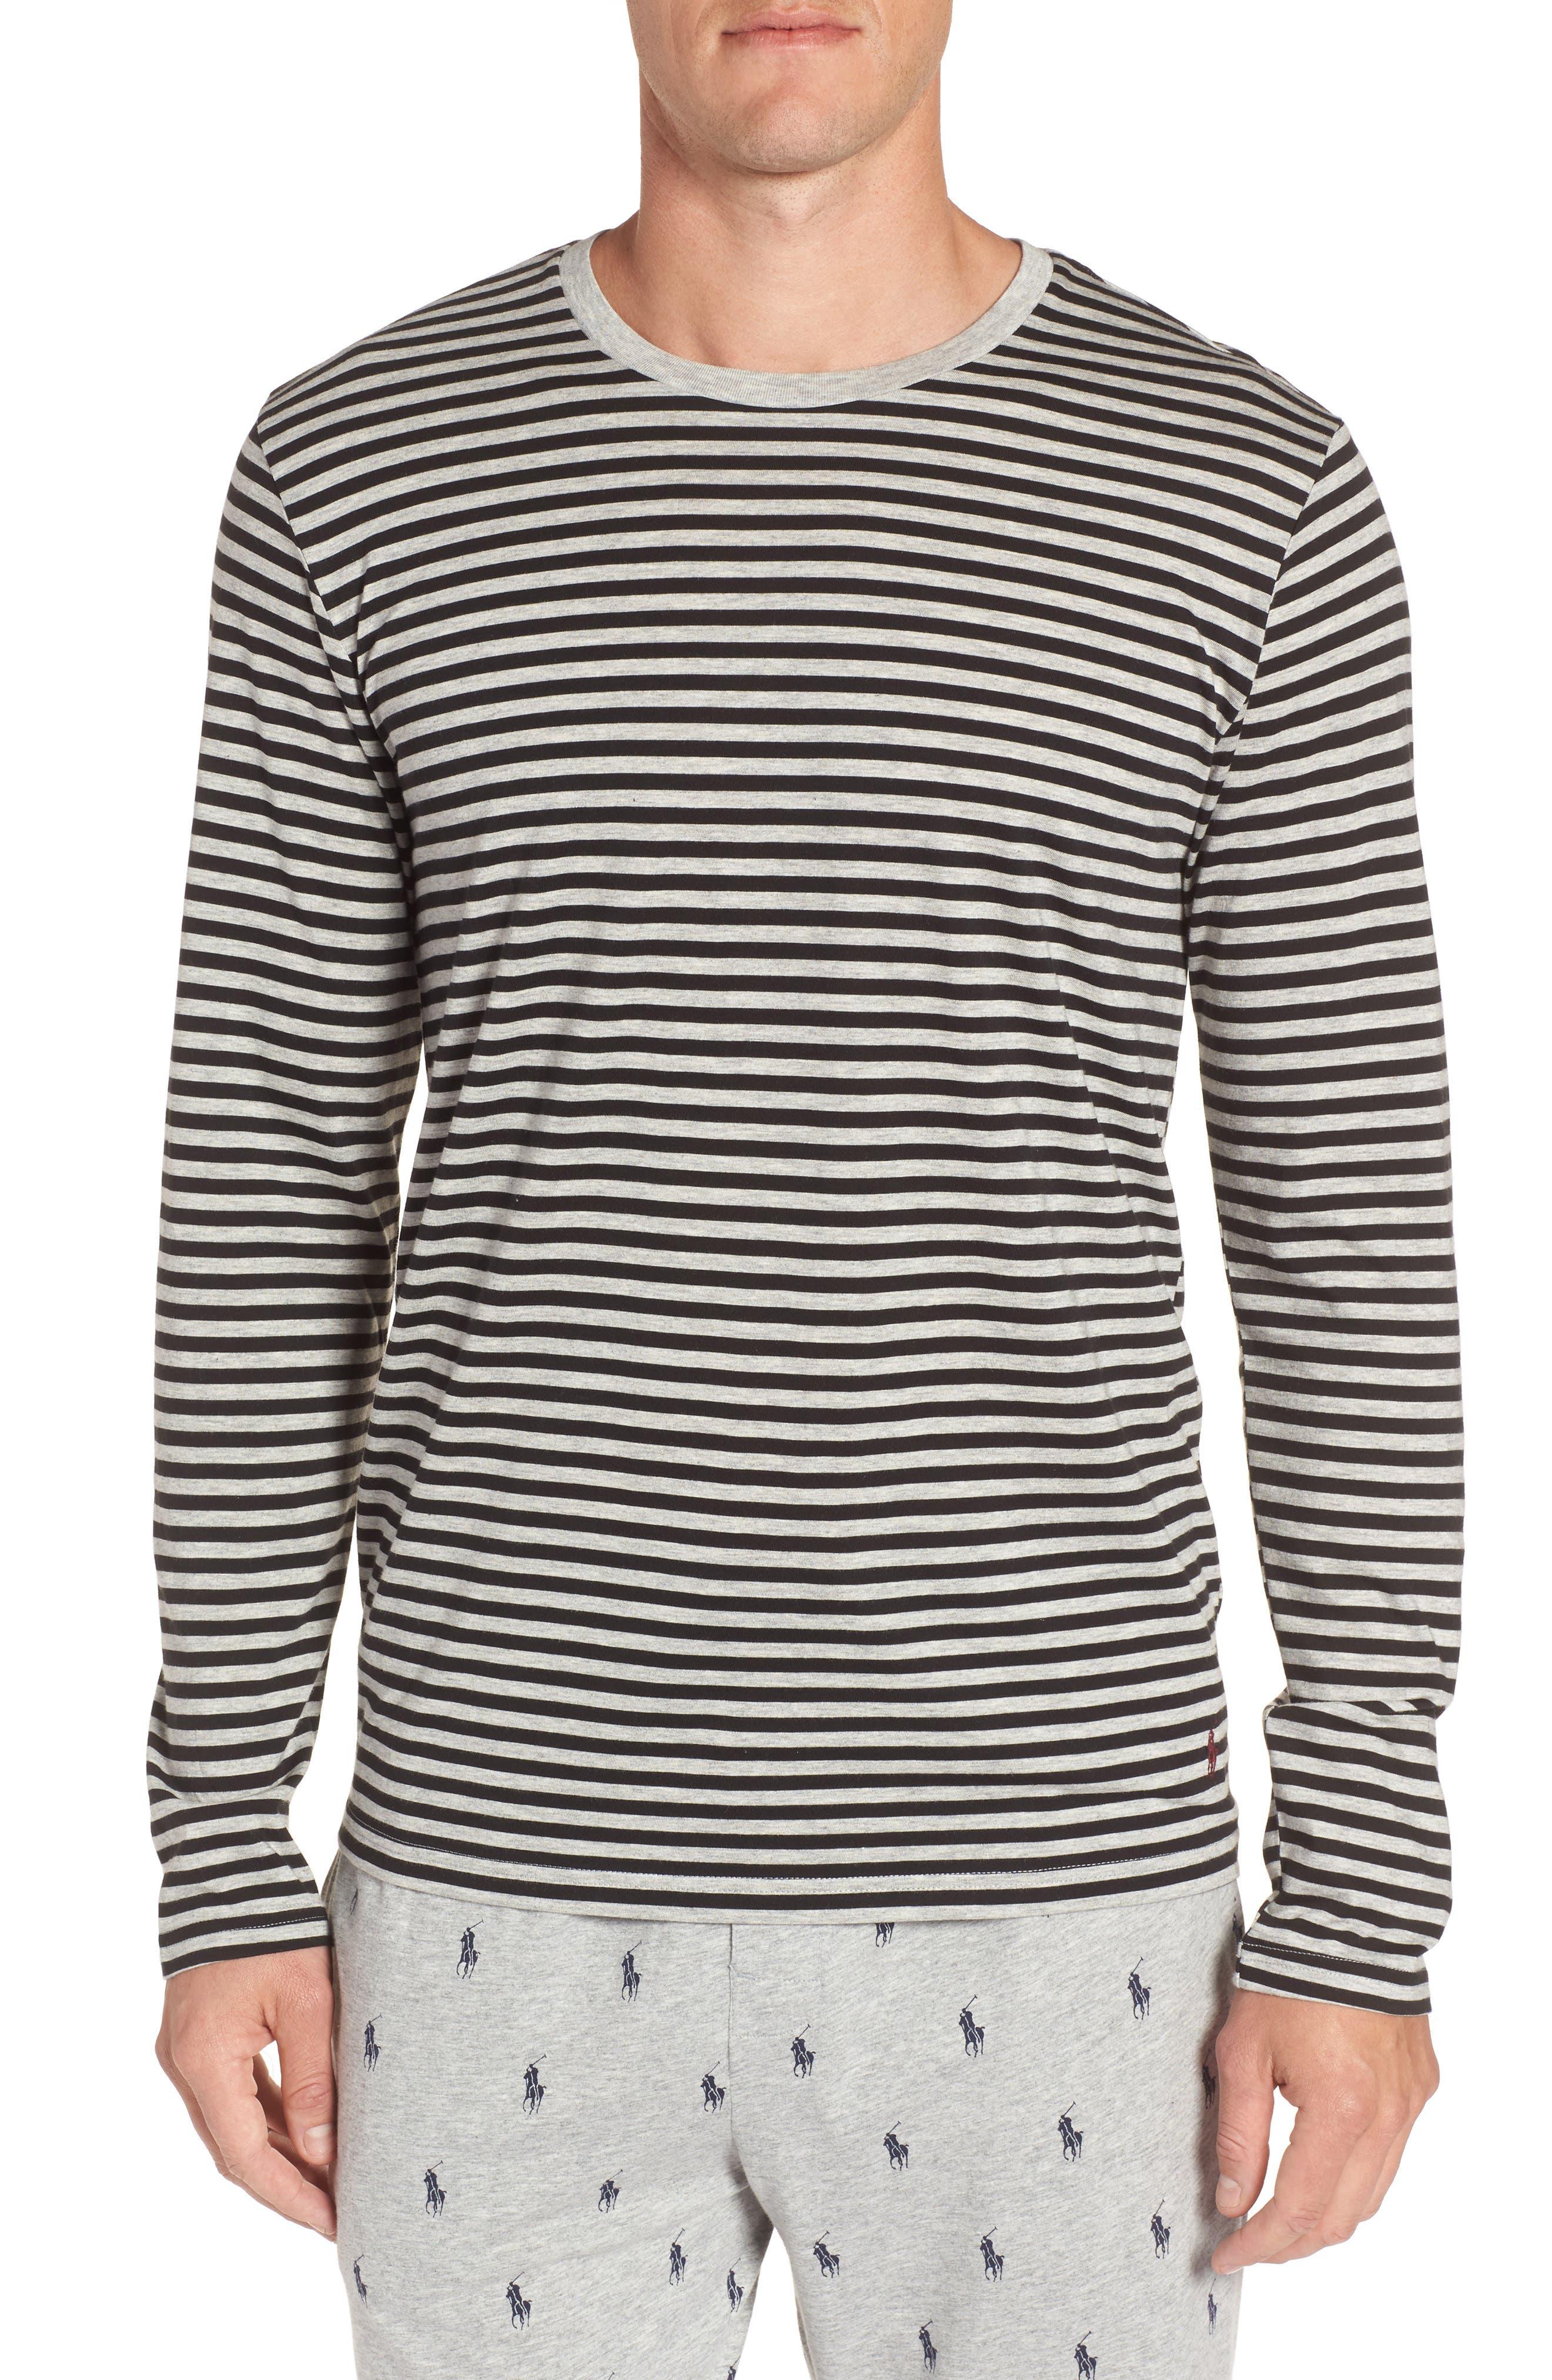 Alternate Image 1 Selected - Polo Ralph Lauren Supreme Comfort Cotton & Modal T-Shirt